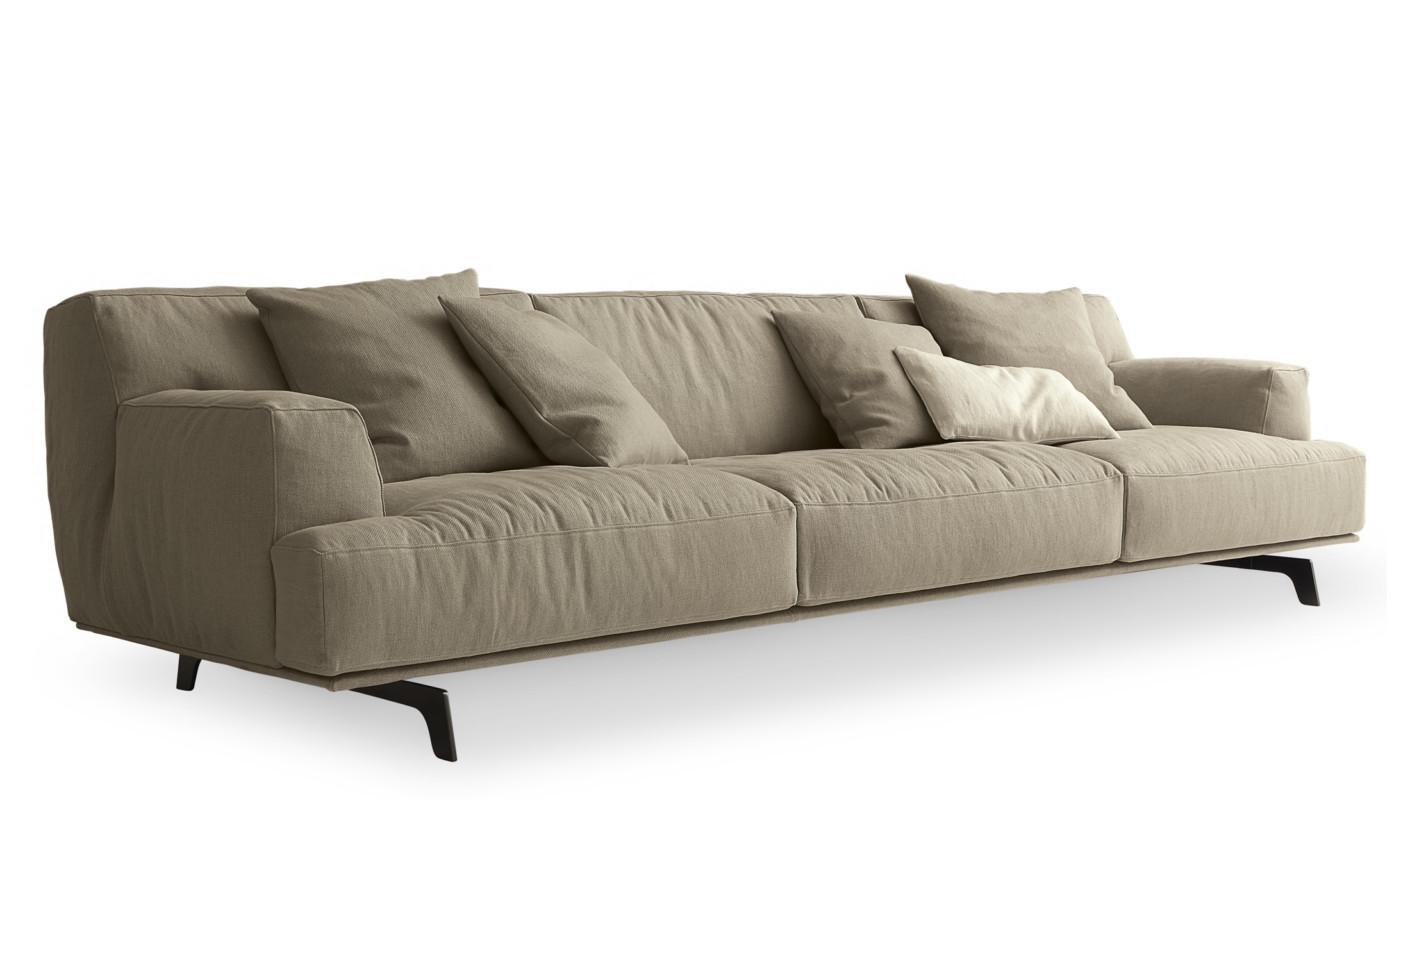 california sofa mfg broyhill zachary reviews tribeca by poliform stylepark